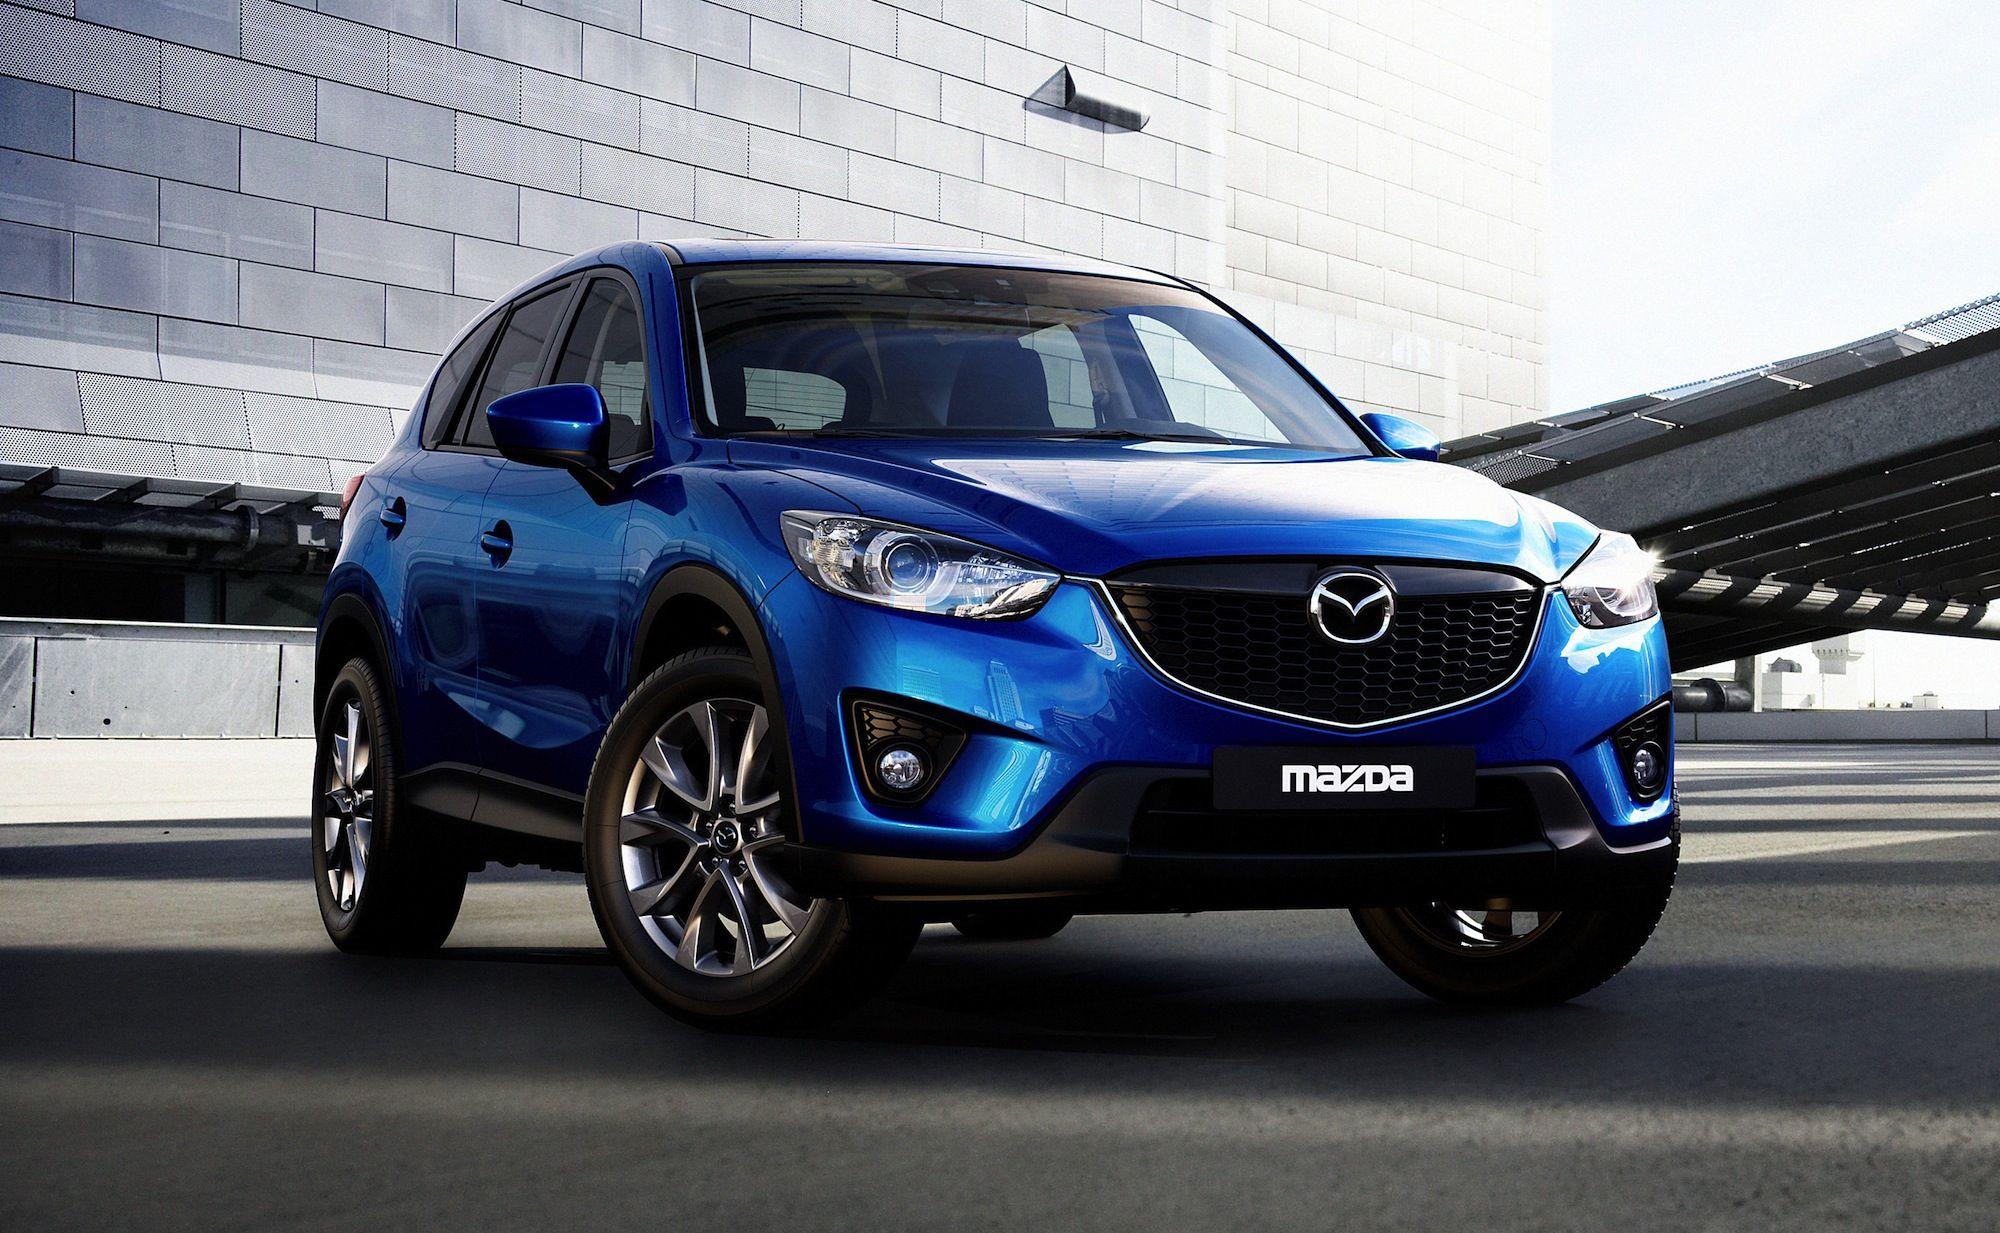 Mazda CX-5 | Mazda Mix | Mazda cx5, Mazda cars, Mazda